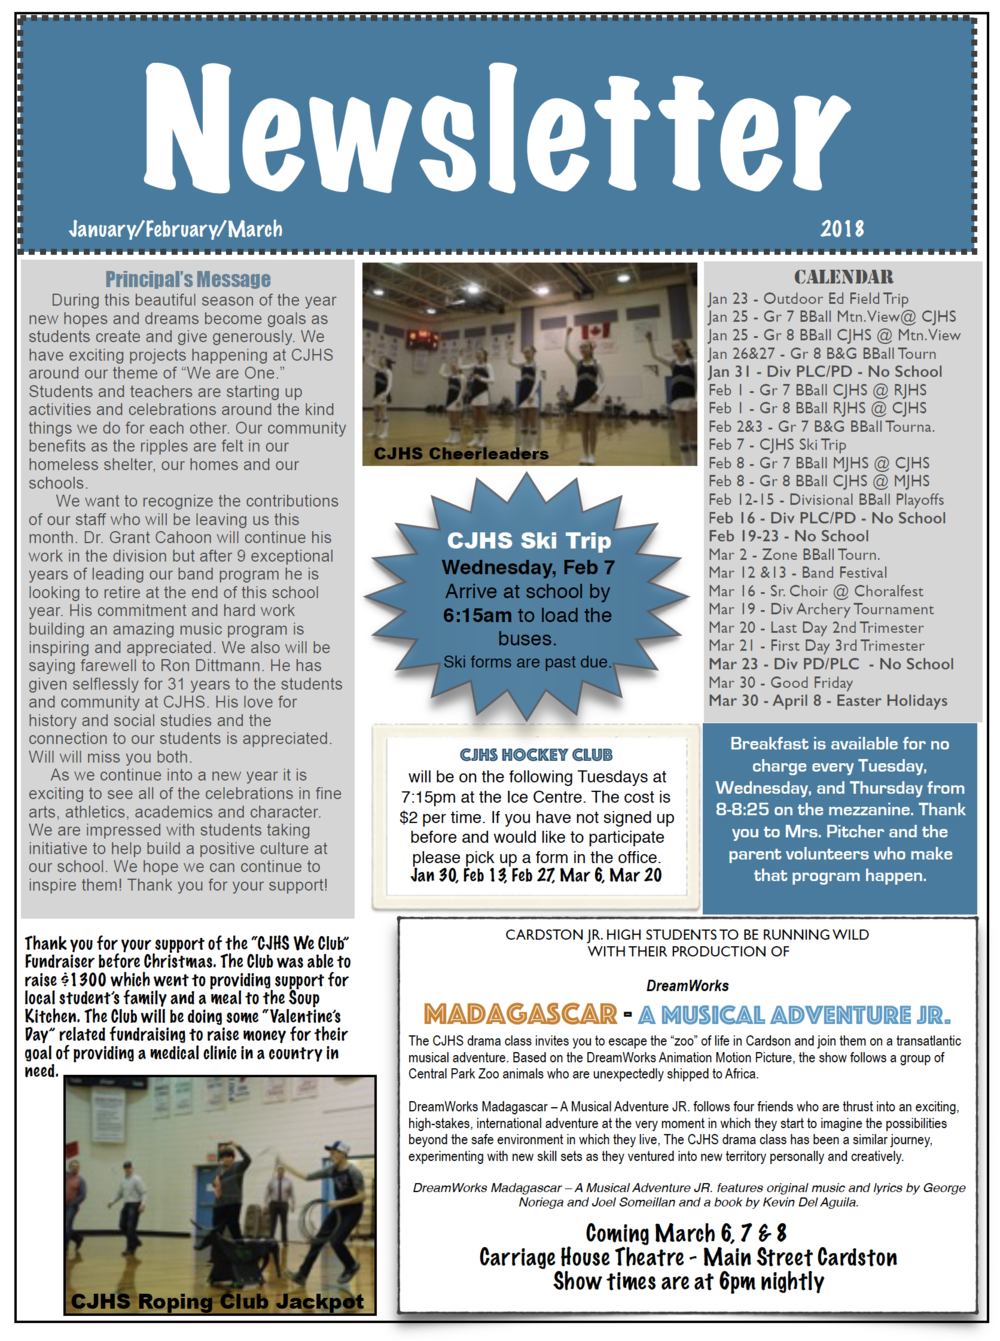 CJHS Jan/Feb/Mar Newsletter